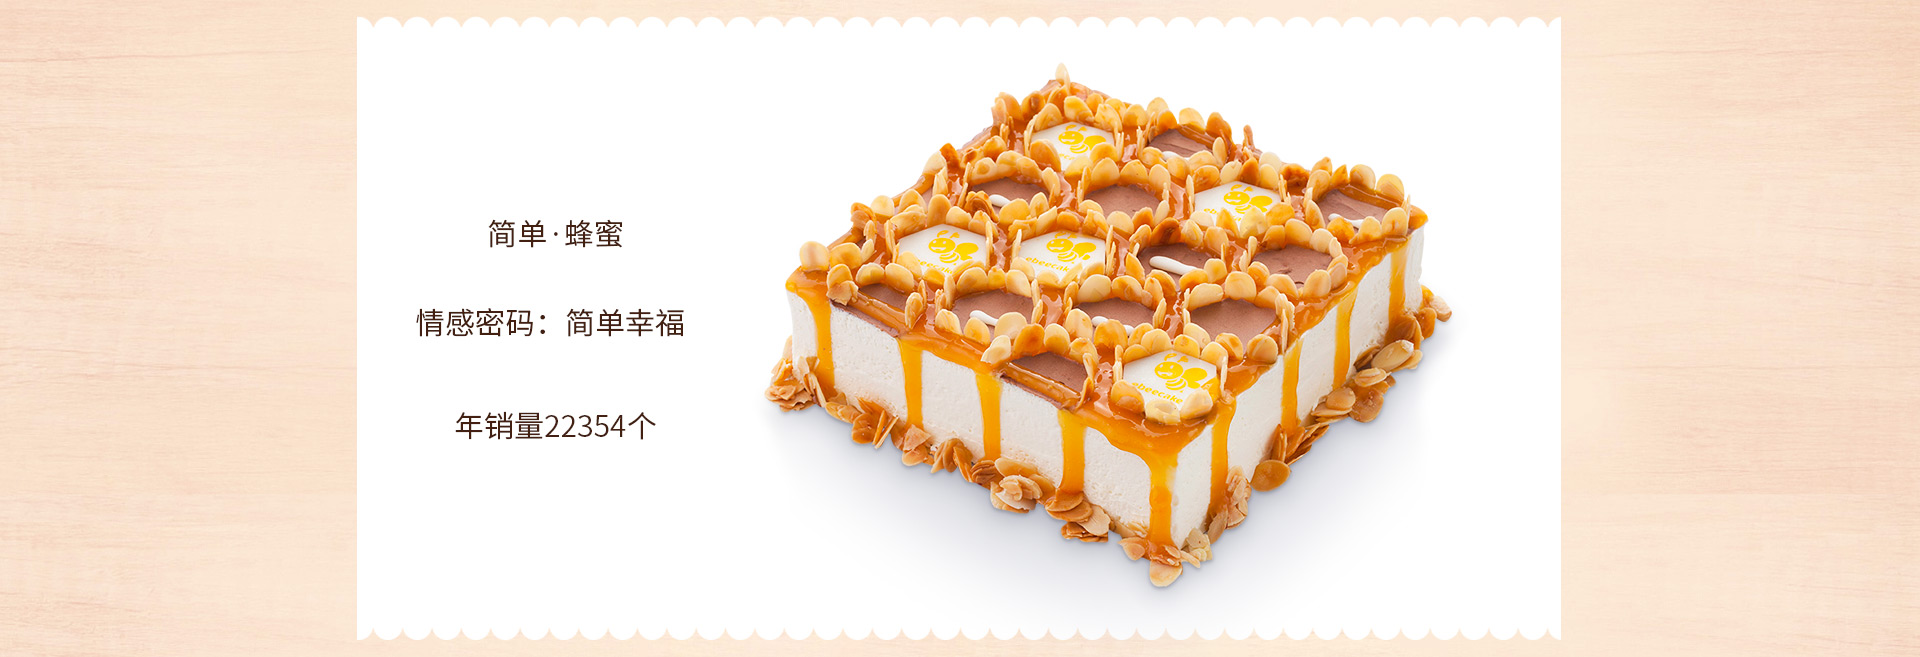 ebeecake小蜜蜂蛋糕 简单|蜂蜜蛋糕